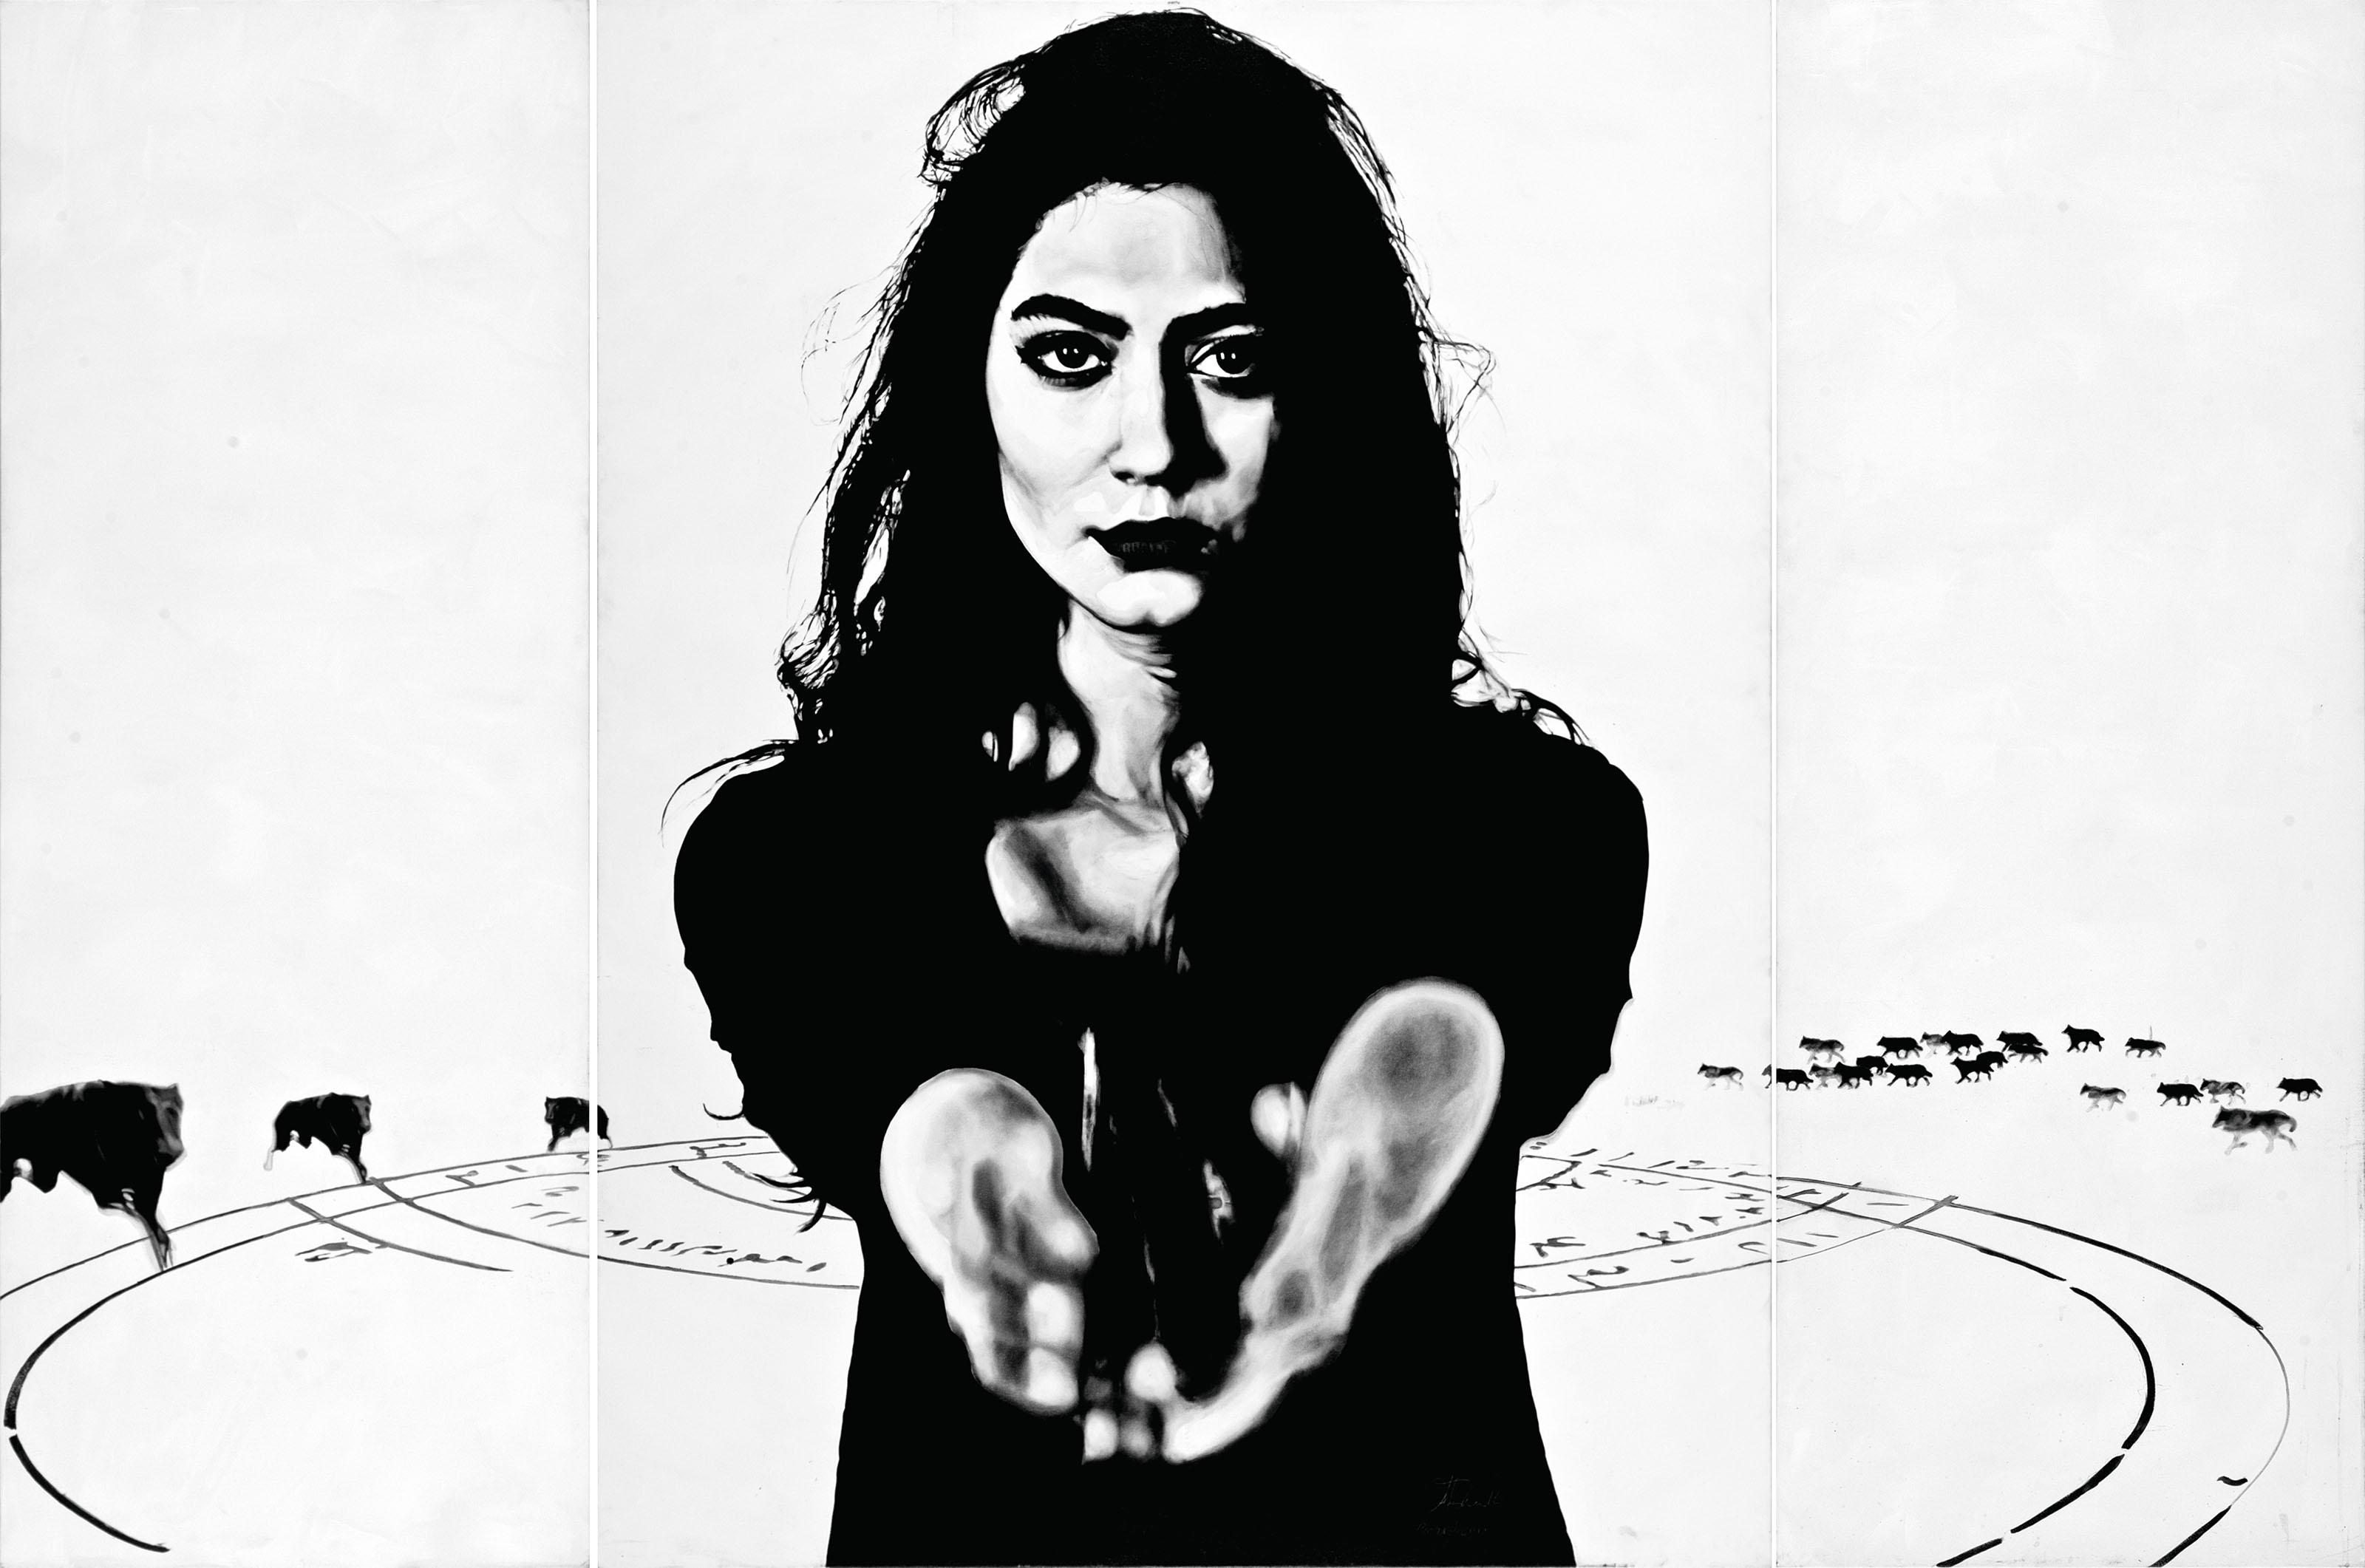 Afshin Pirhashemi (Iranian, b. 1974)